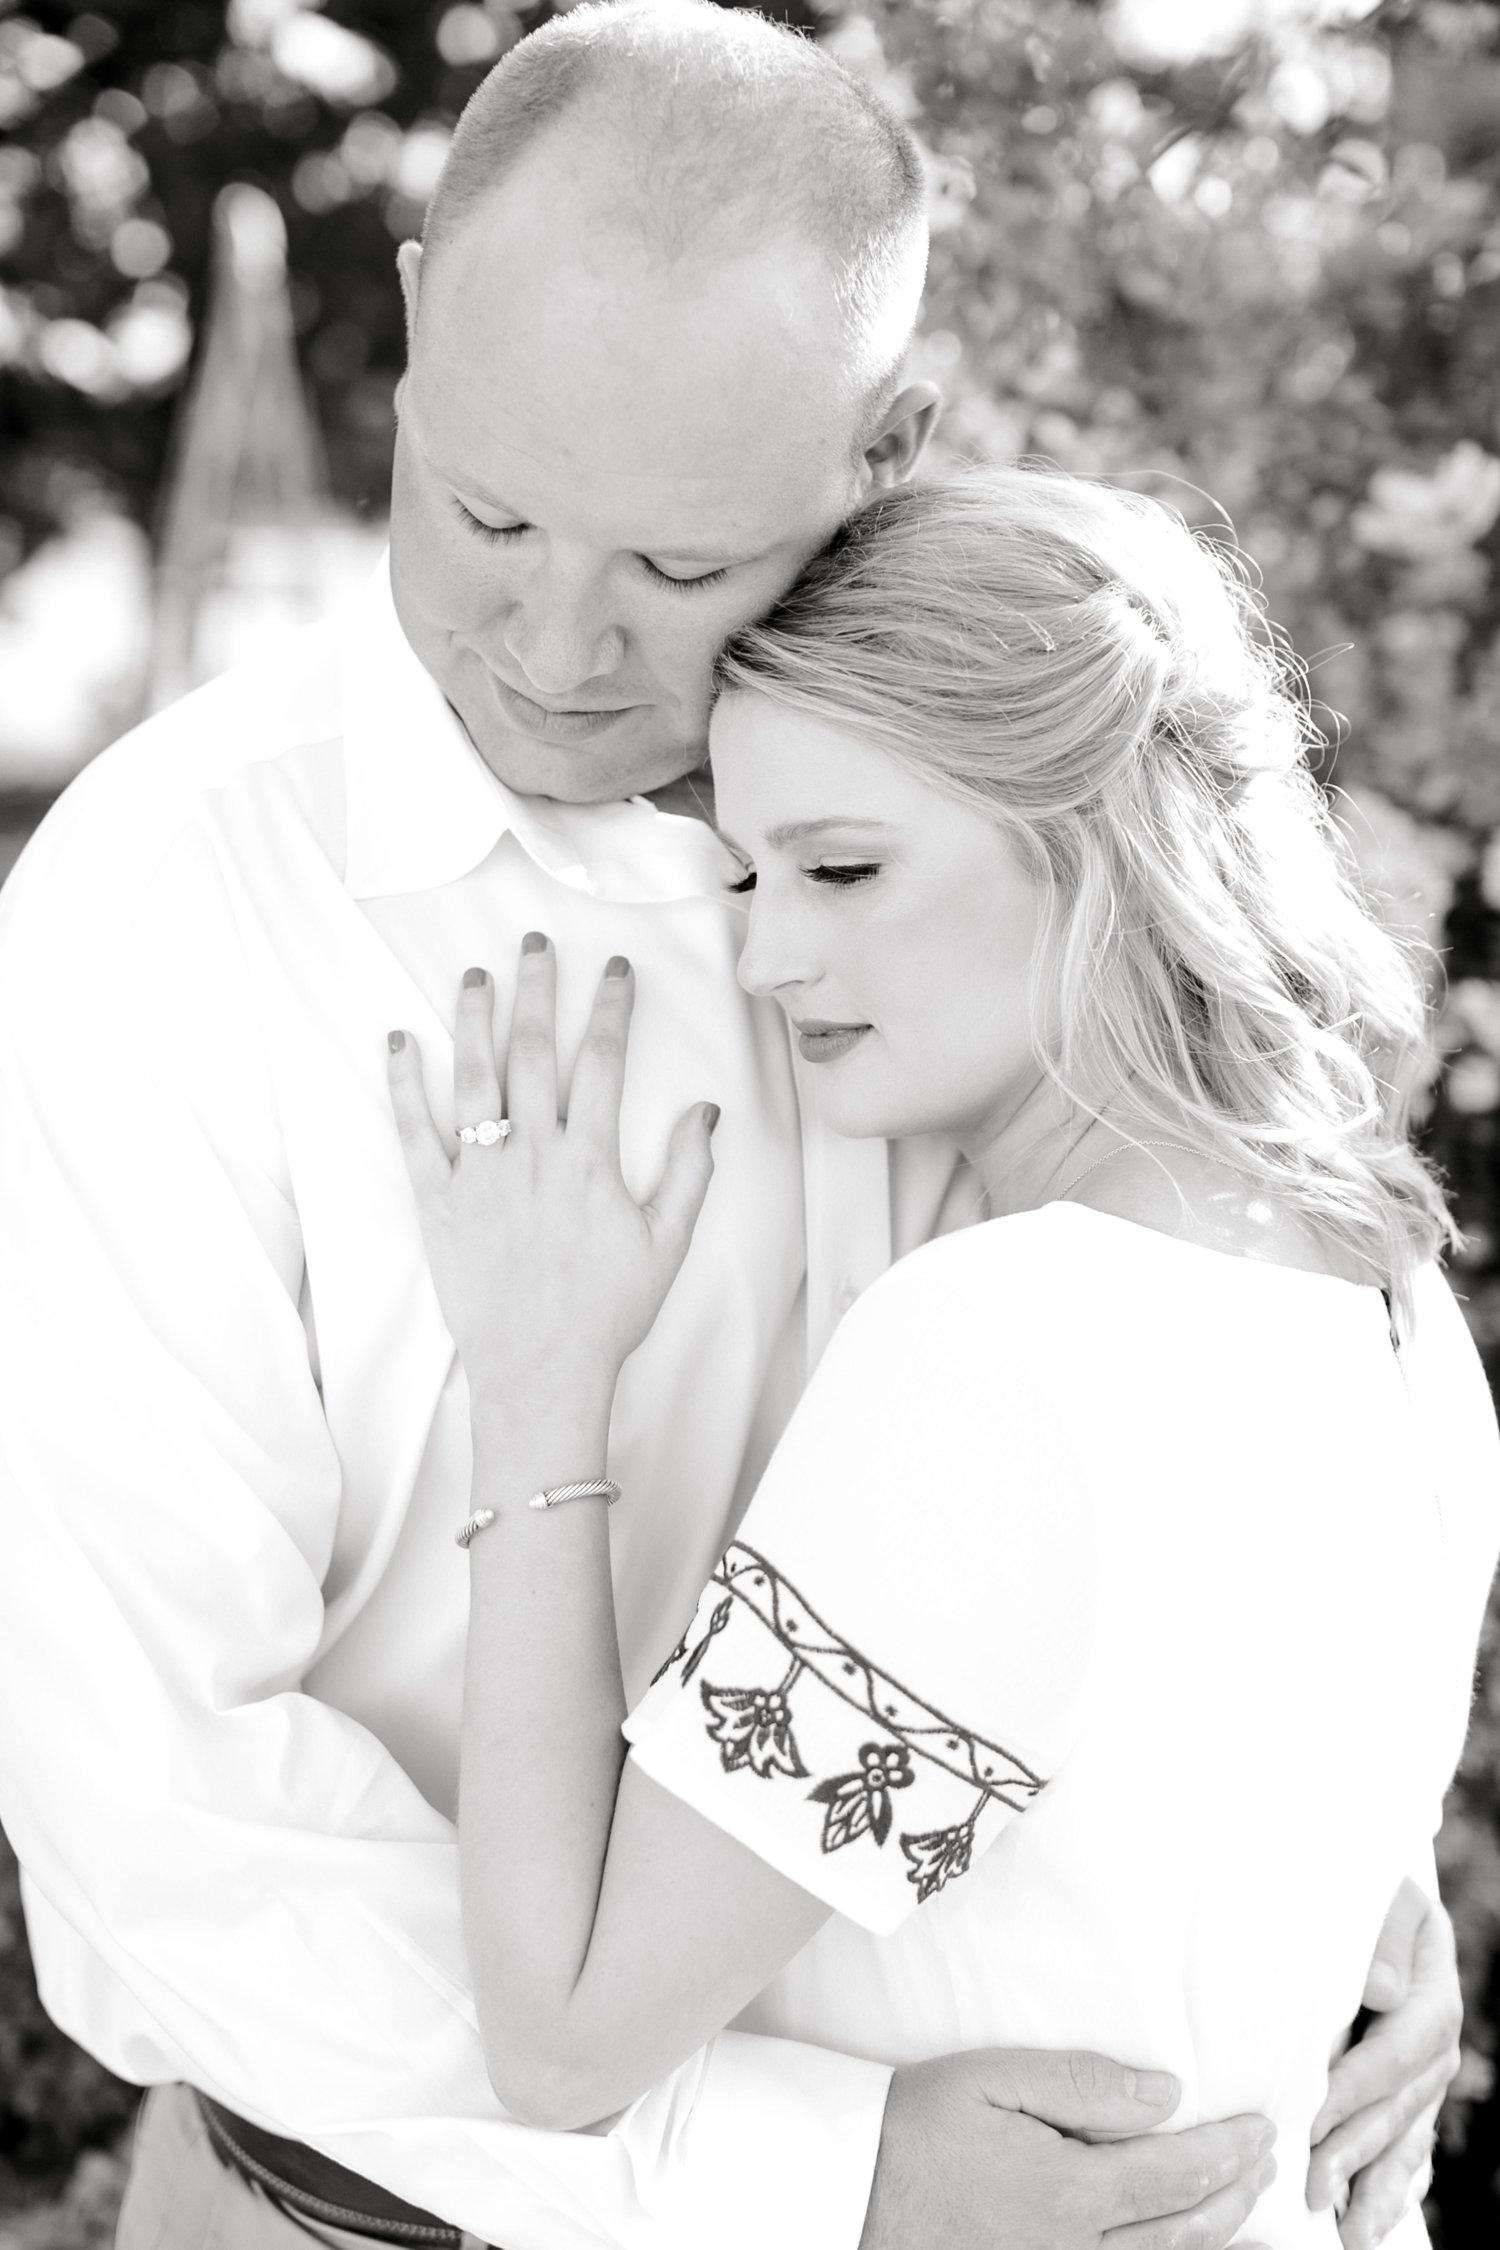 Morgan_and_Chris_Hebert_ALLEEJ_Engagement_Photographer_Lubbock_0012.jpg